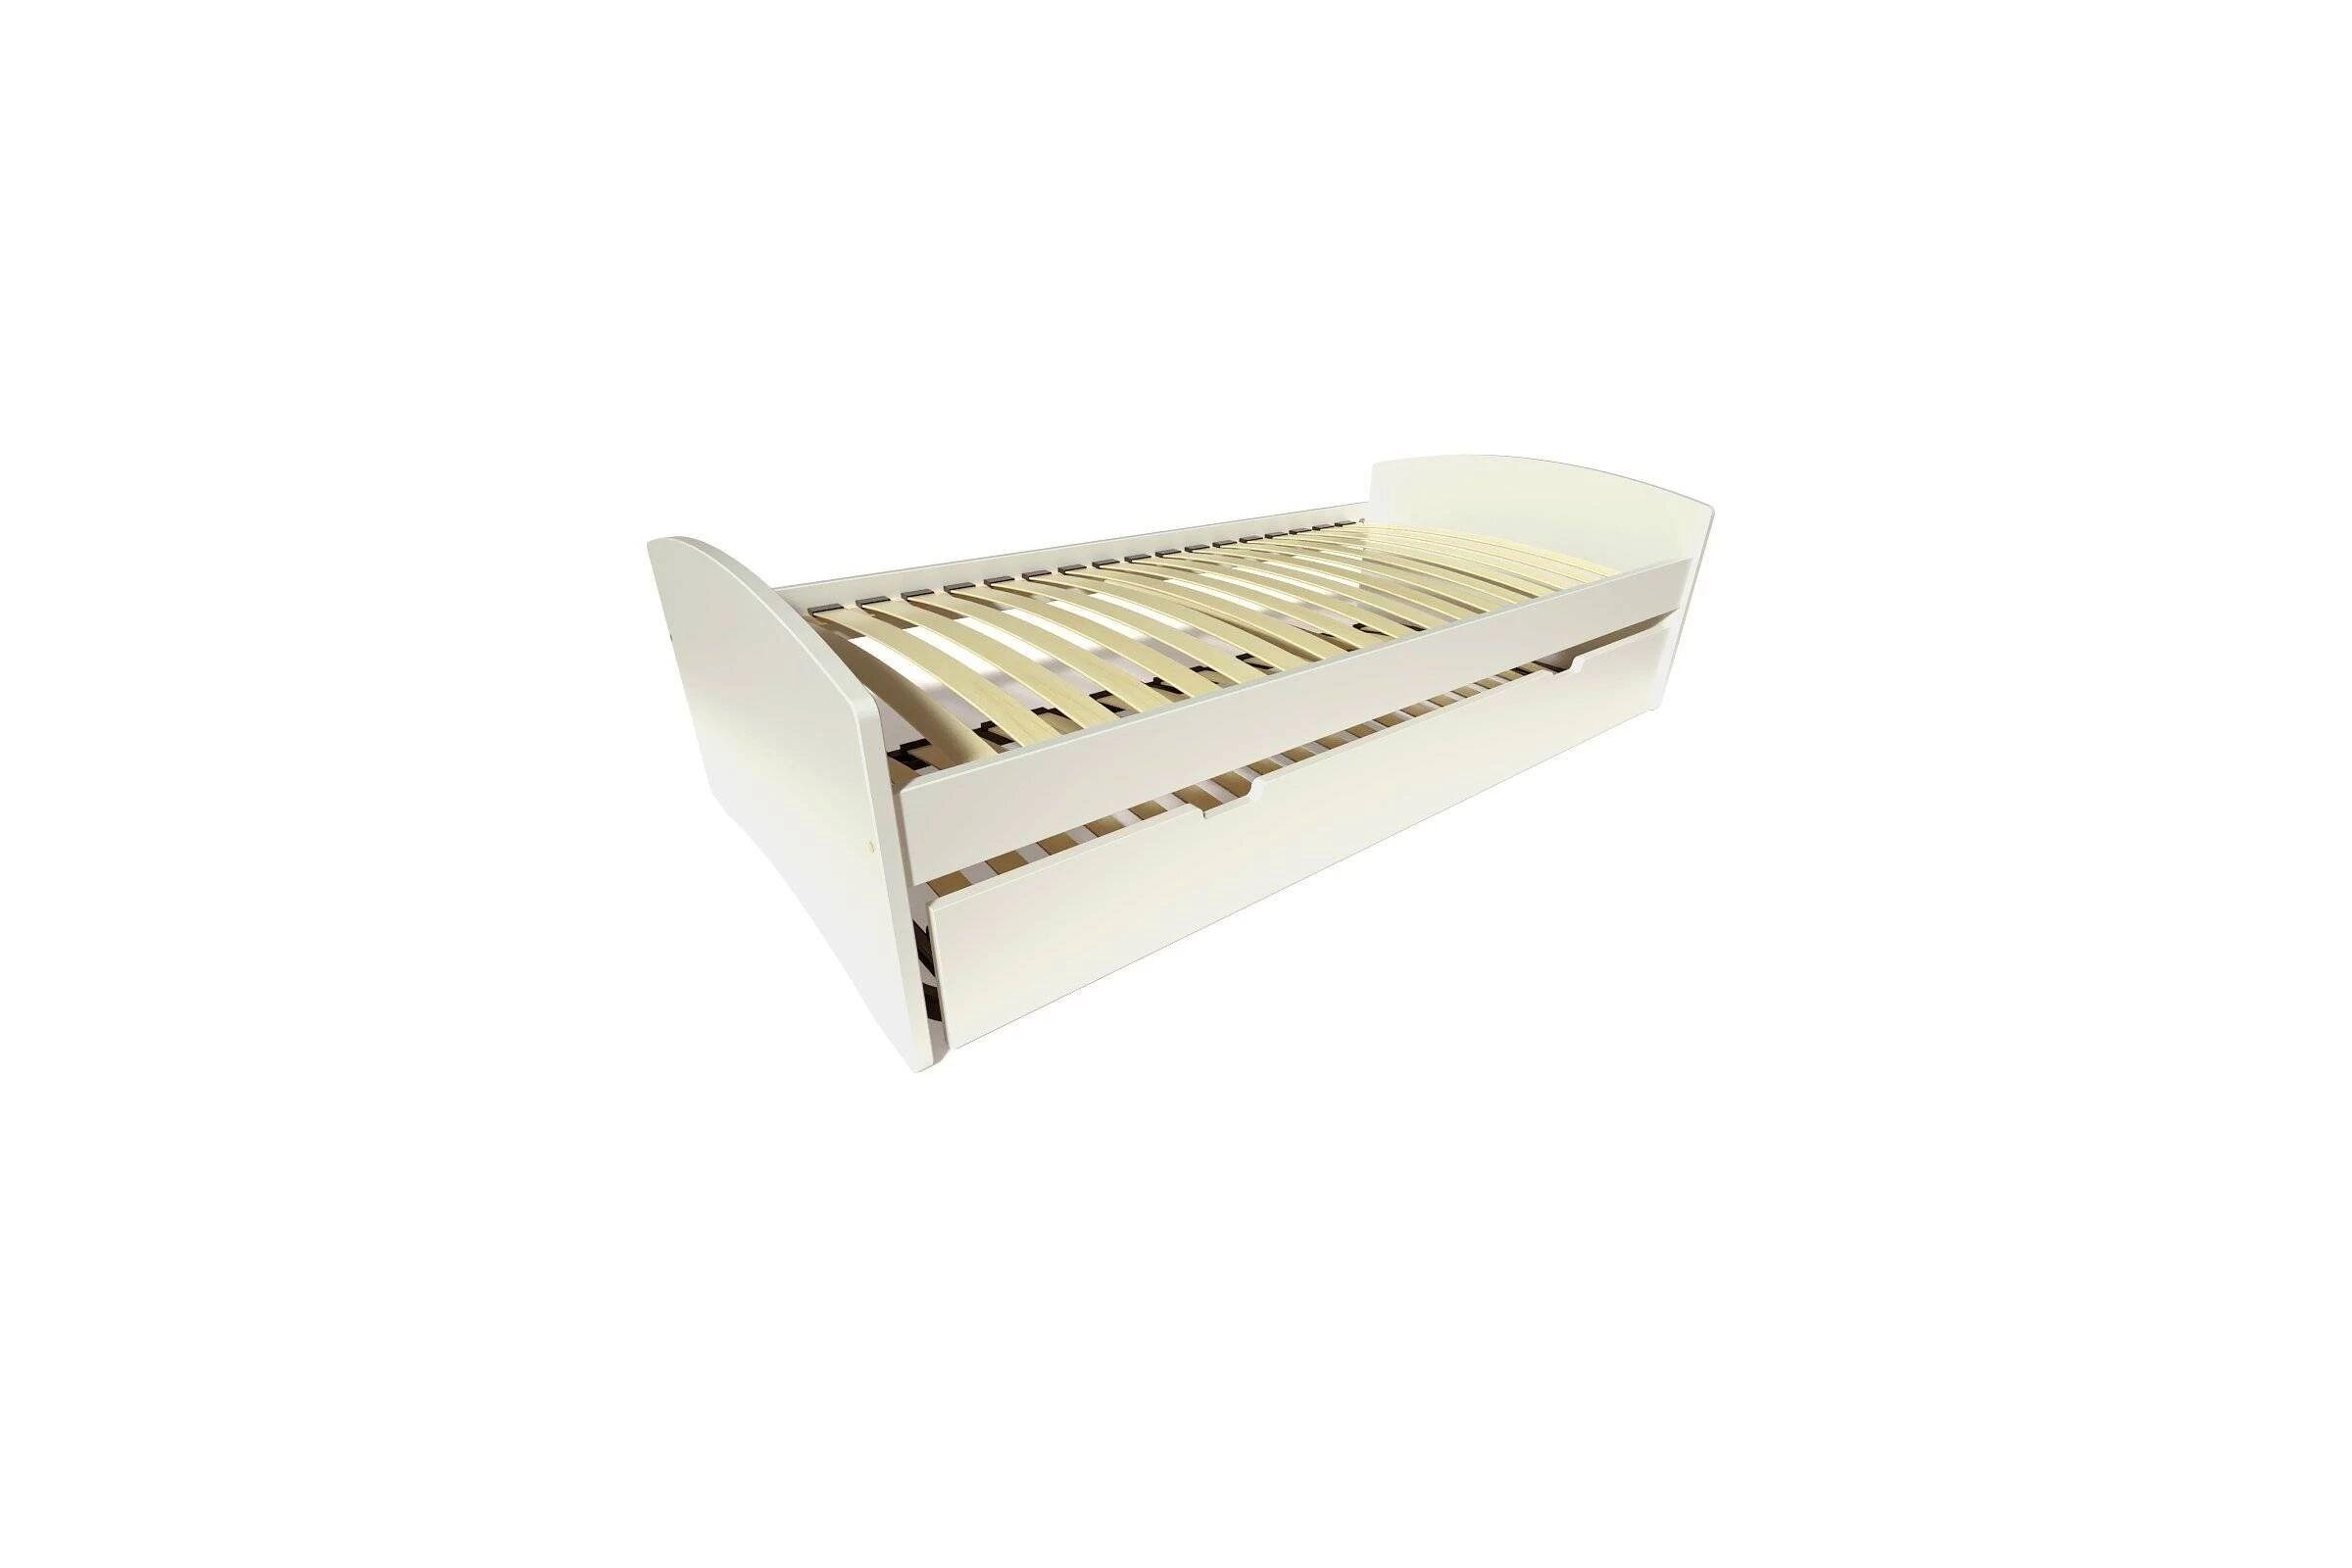 Abc meubles - lit gigogne happy pin massif ivoire 80x190